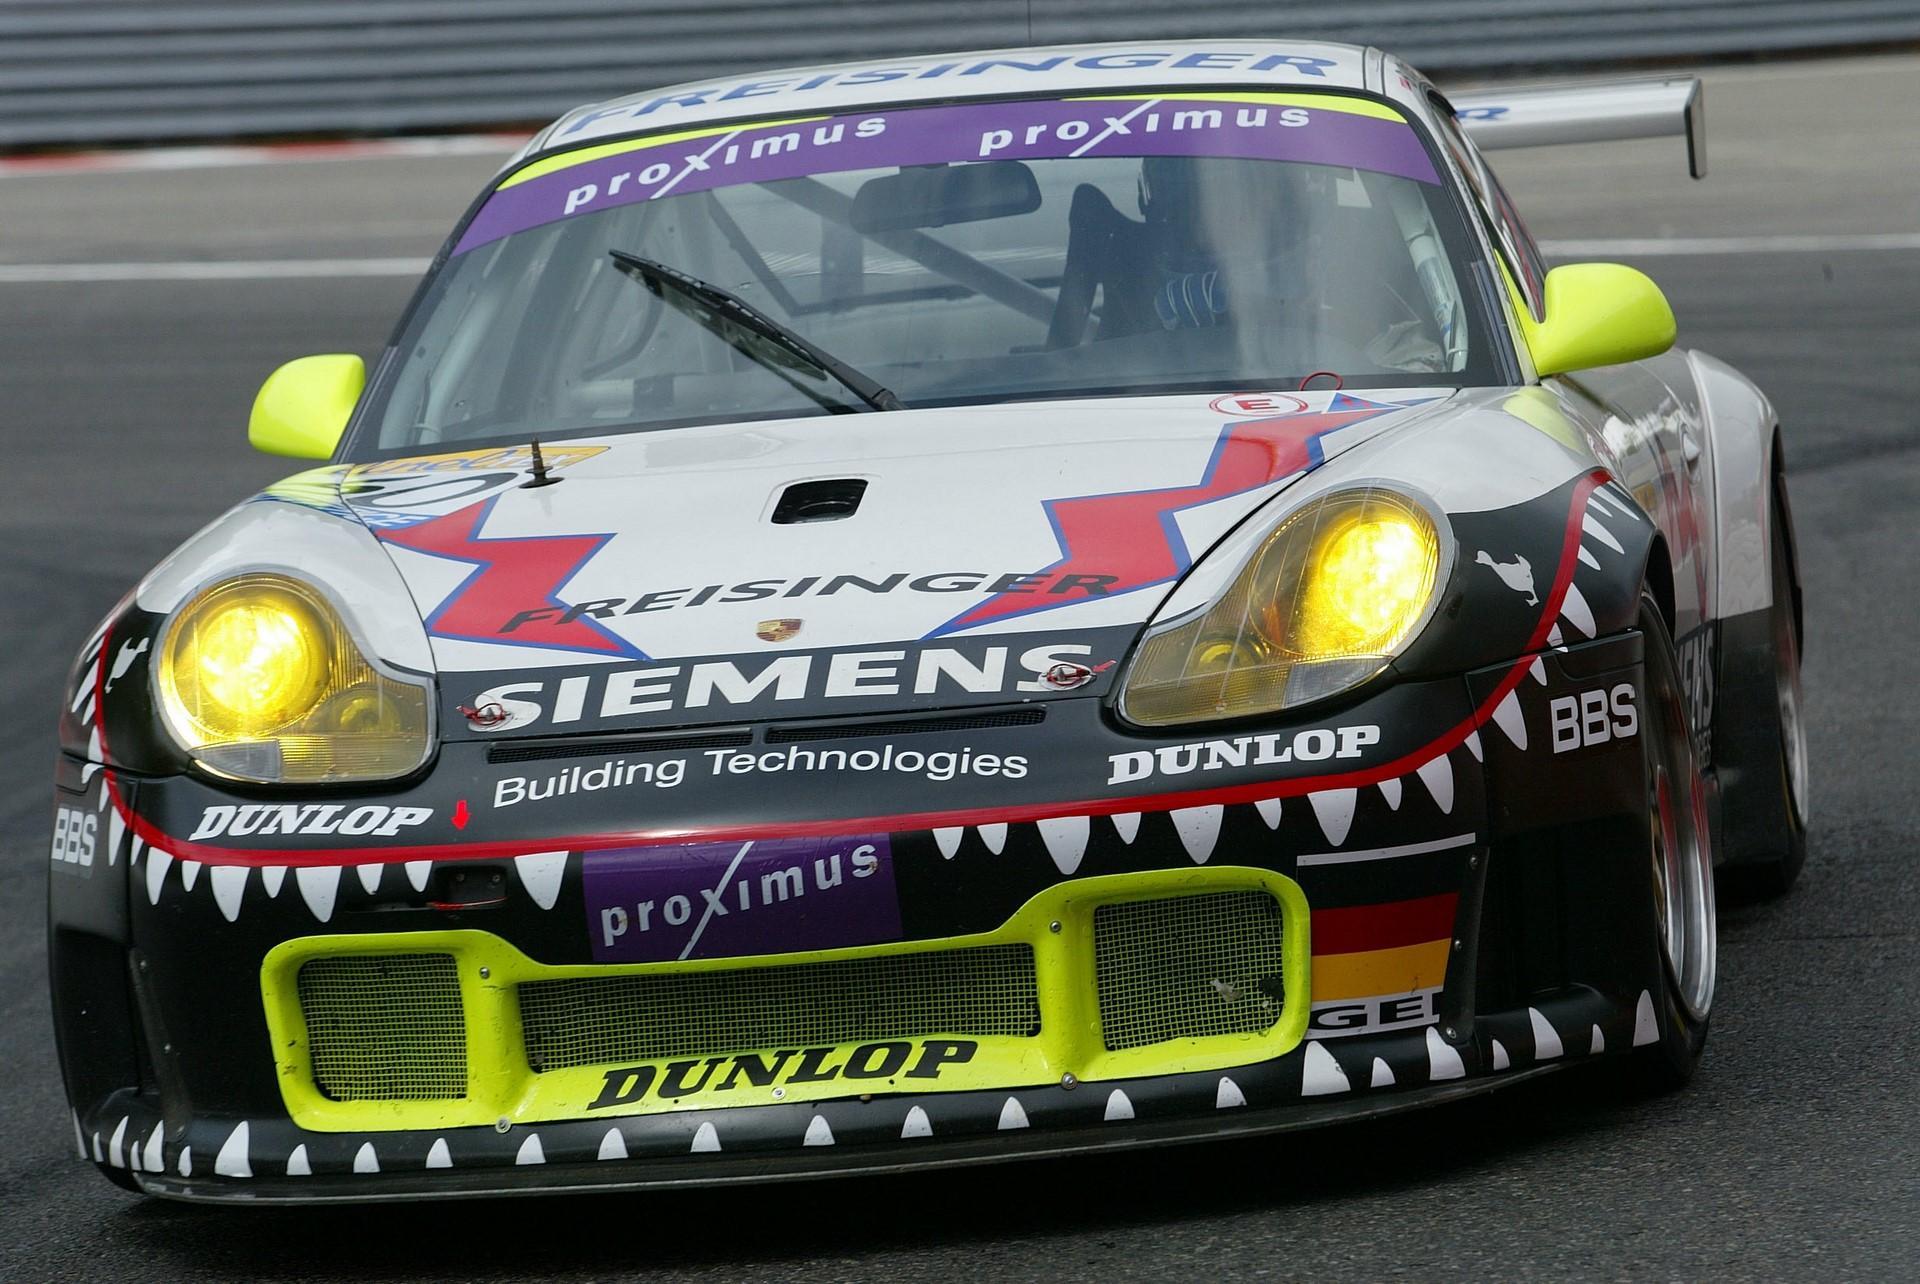 20-years-of-the-Porsche-911-GT3-54